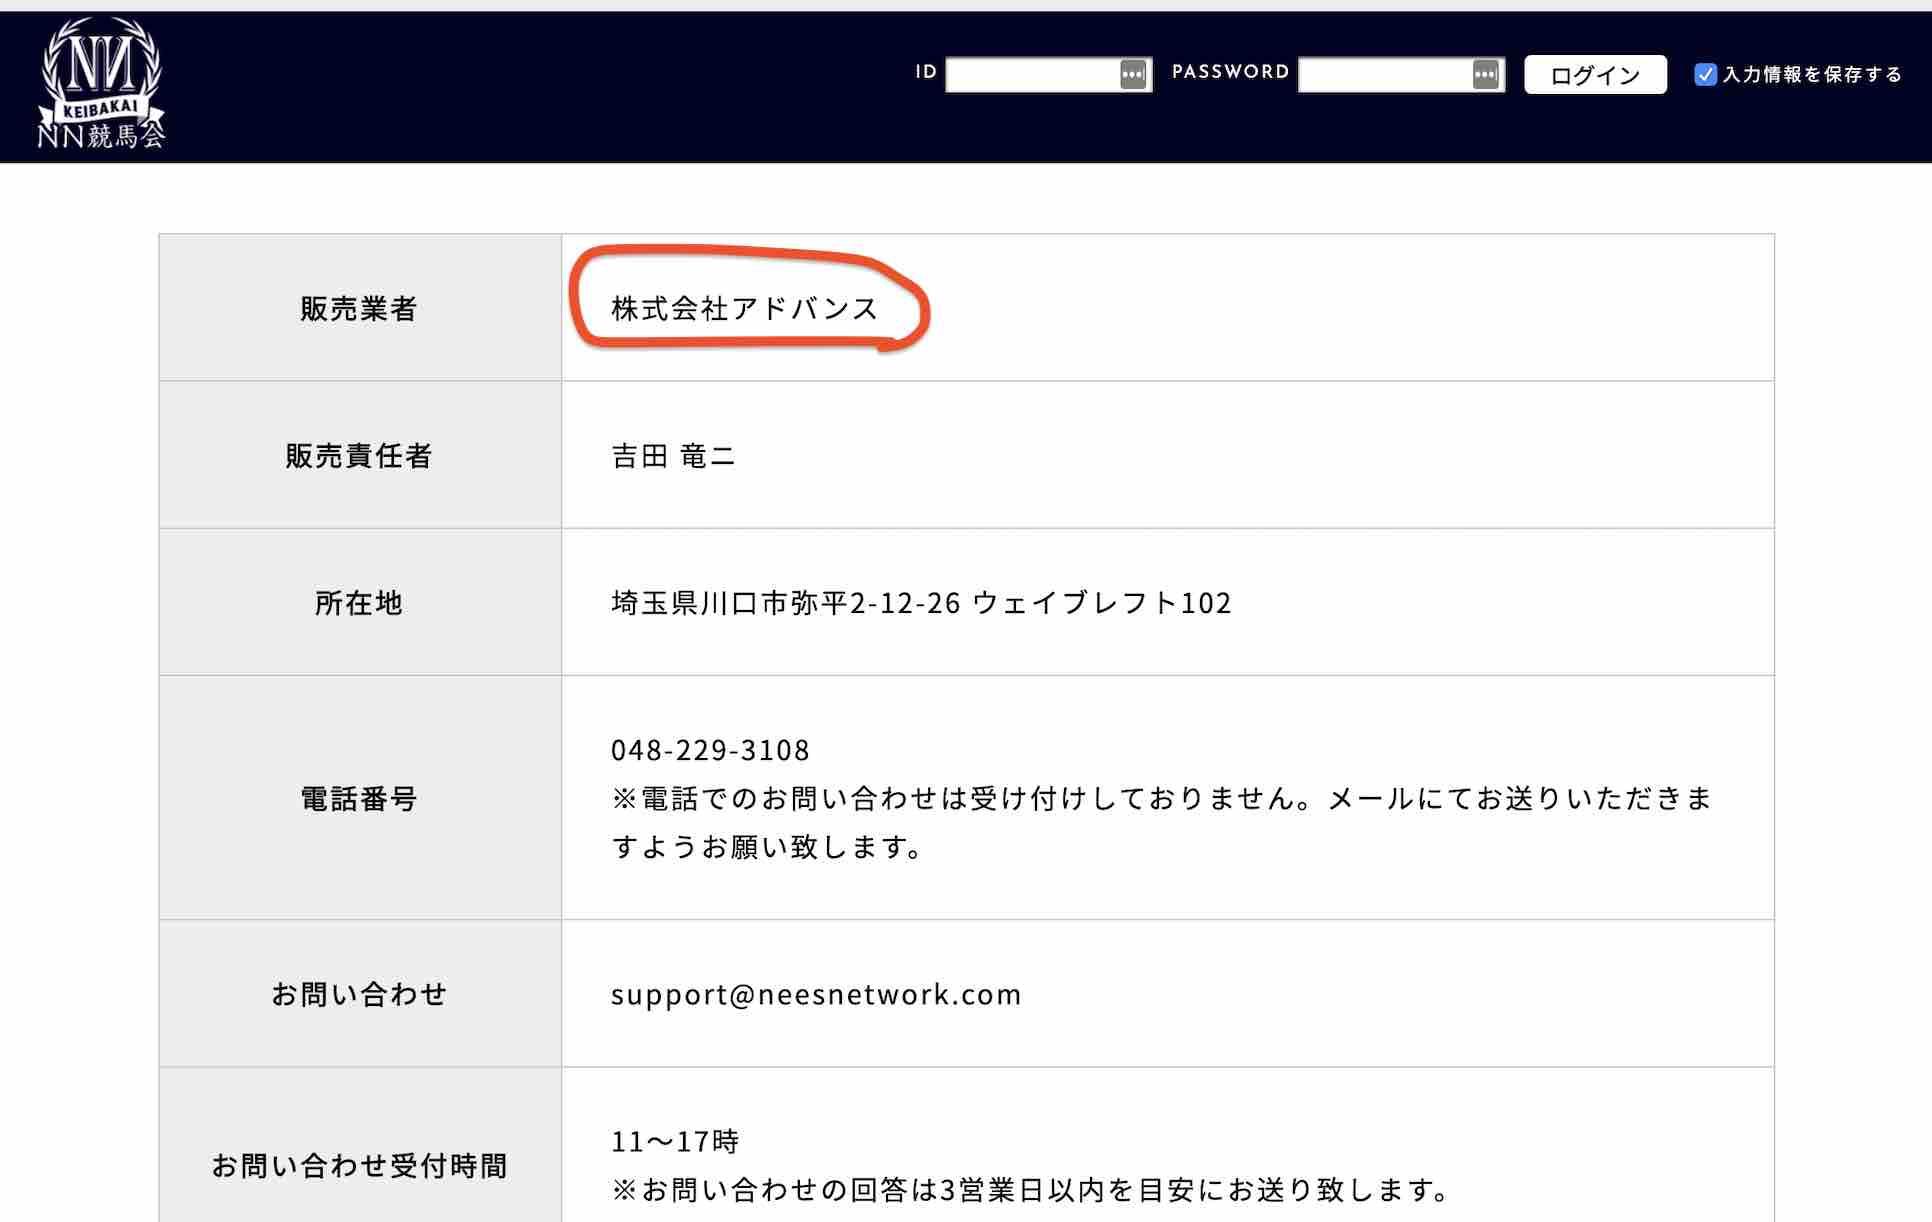 NN競馬会という競馬予想サイトの運営社はアドバンス